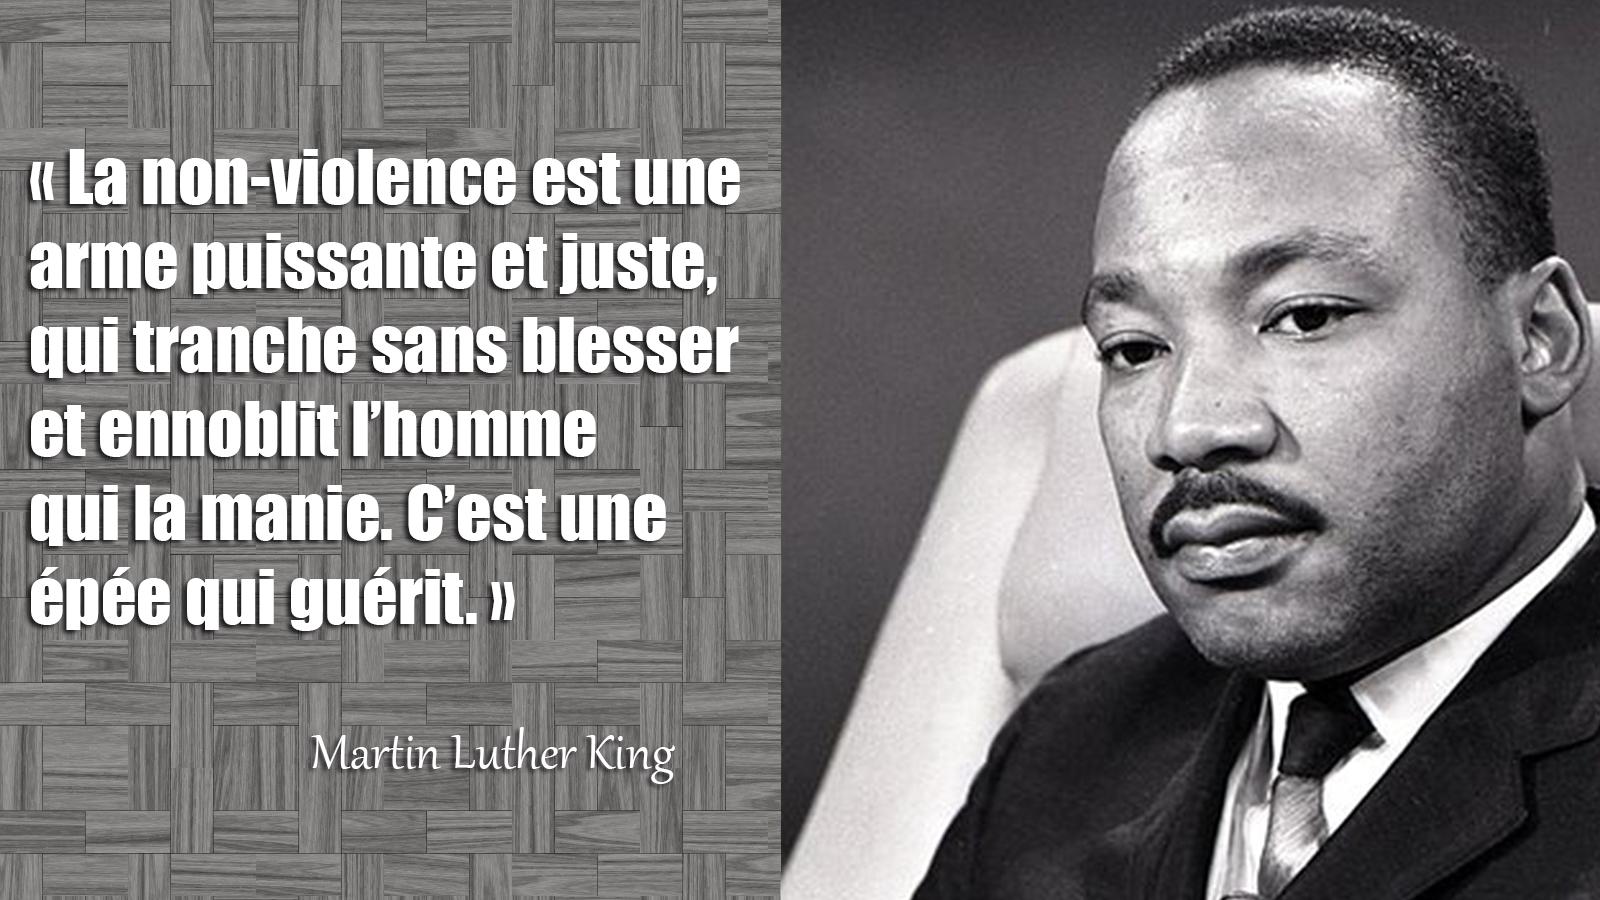 Kreyol Spiritual Hommage Du Jour à Martin Luther King Jr